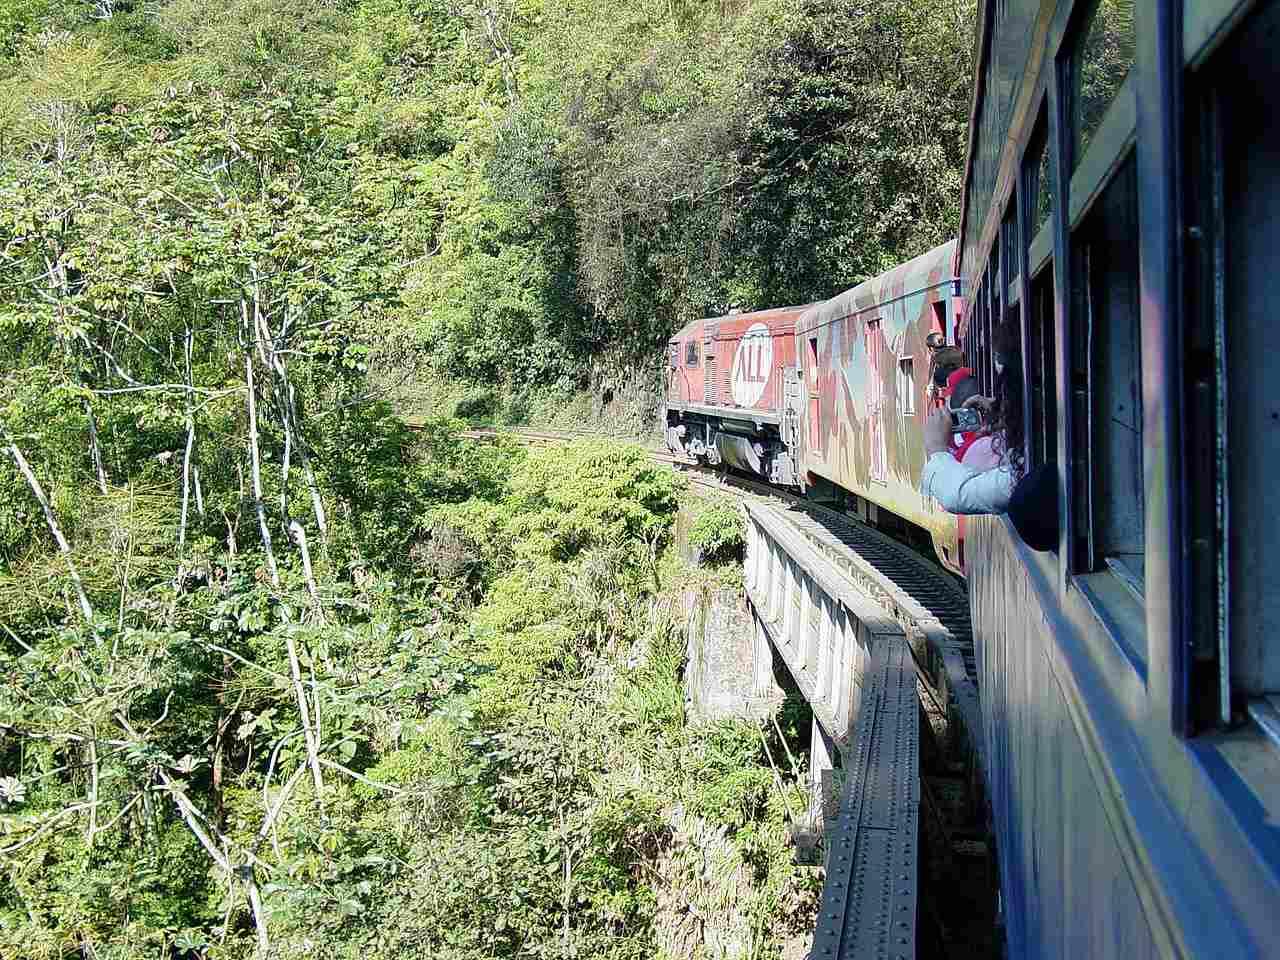 Train ride from Curitiba to Morretes, Brazil.